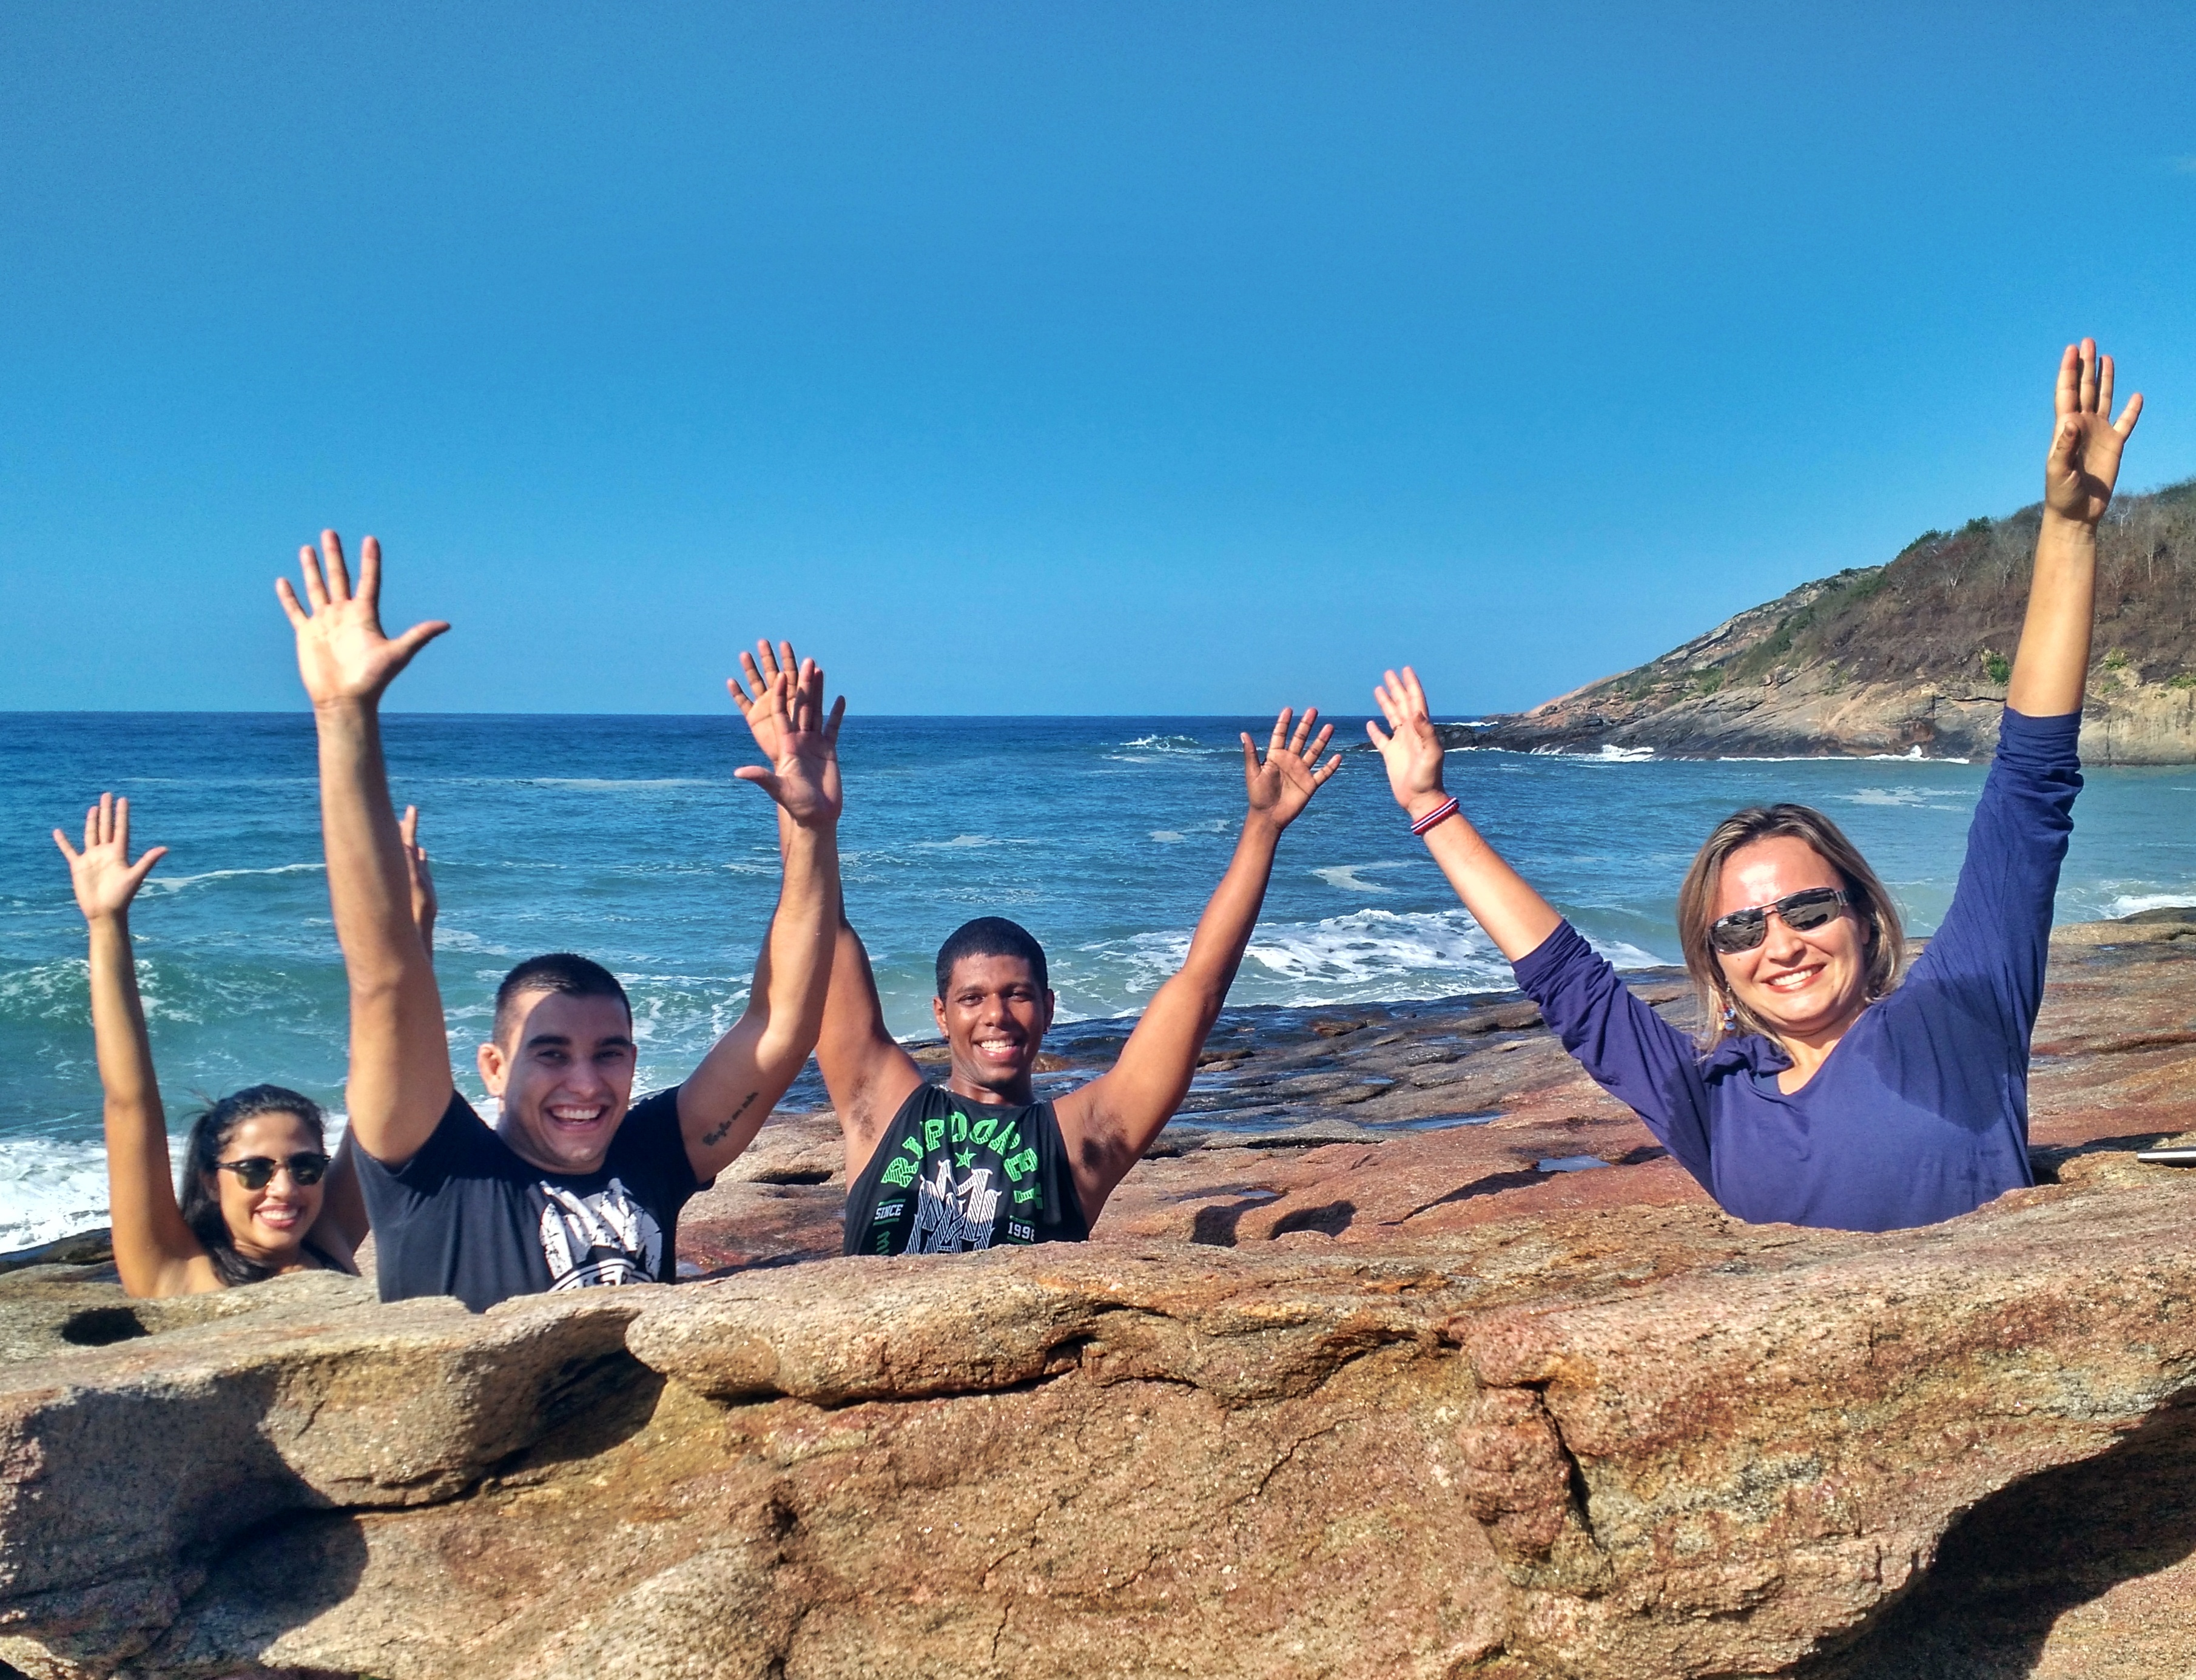 Pedra da Lua, Rio Running Tour